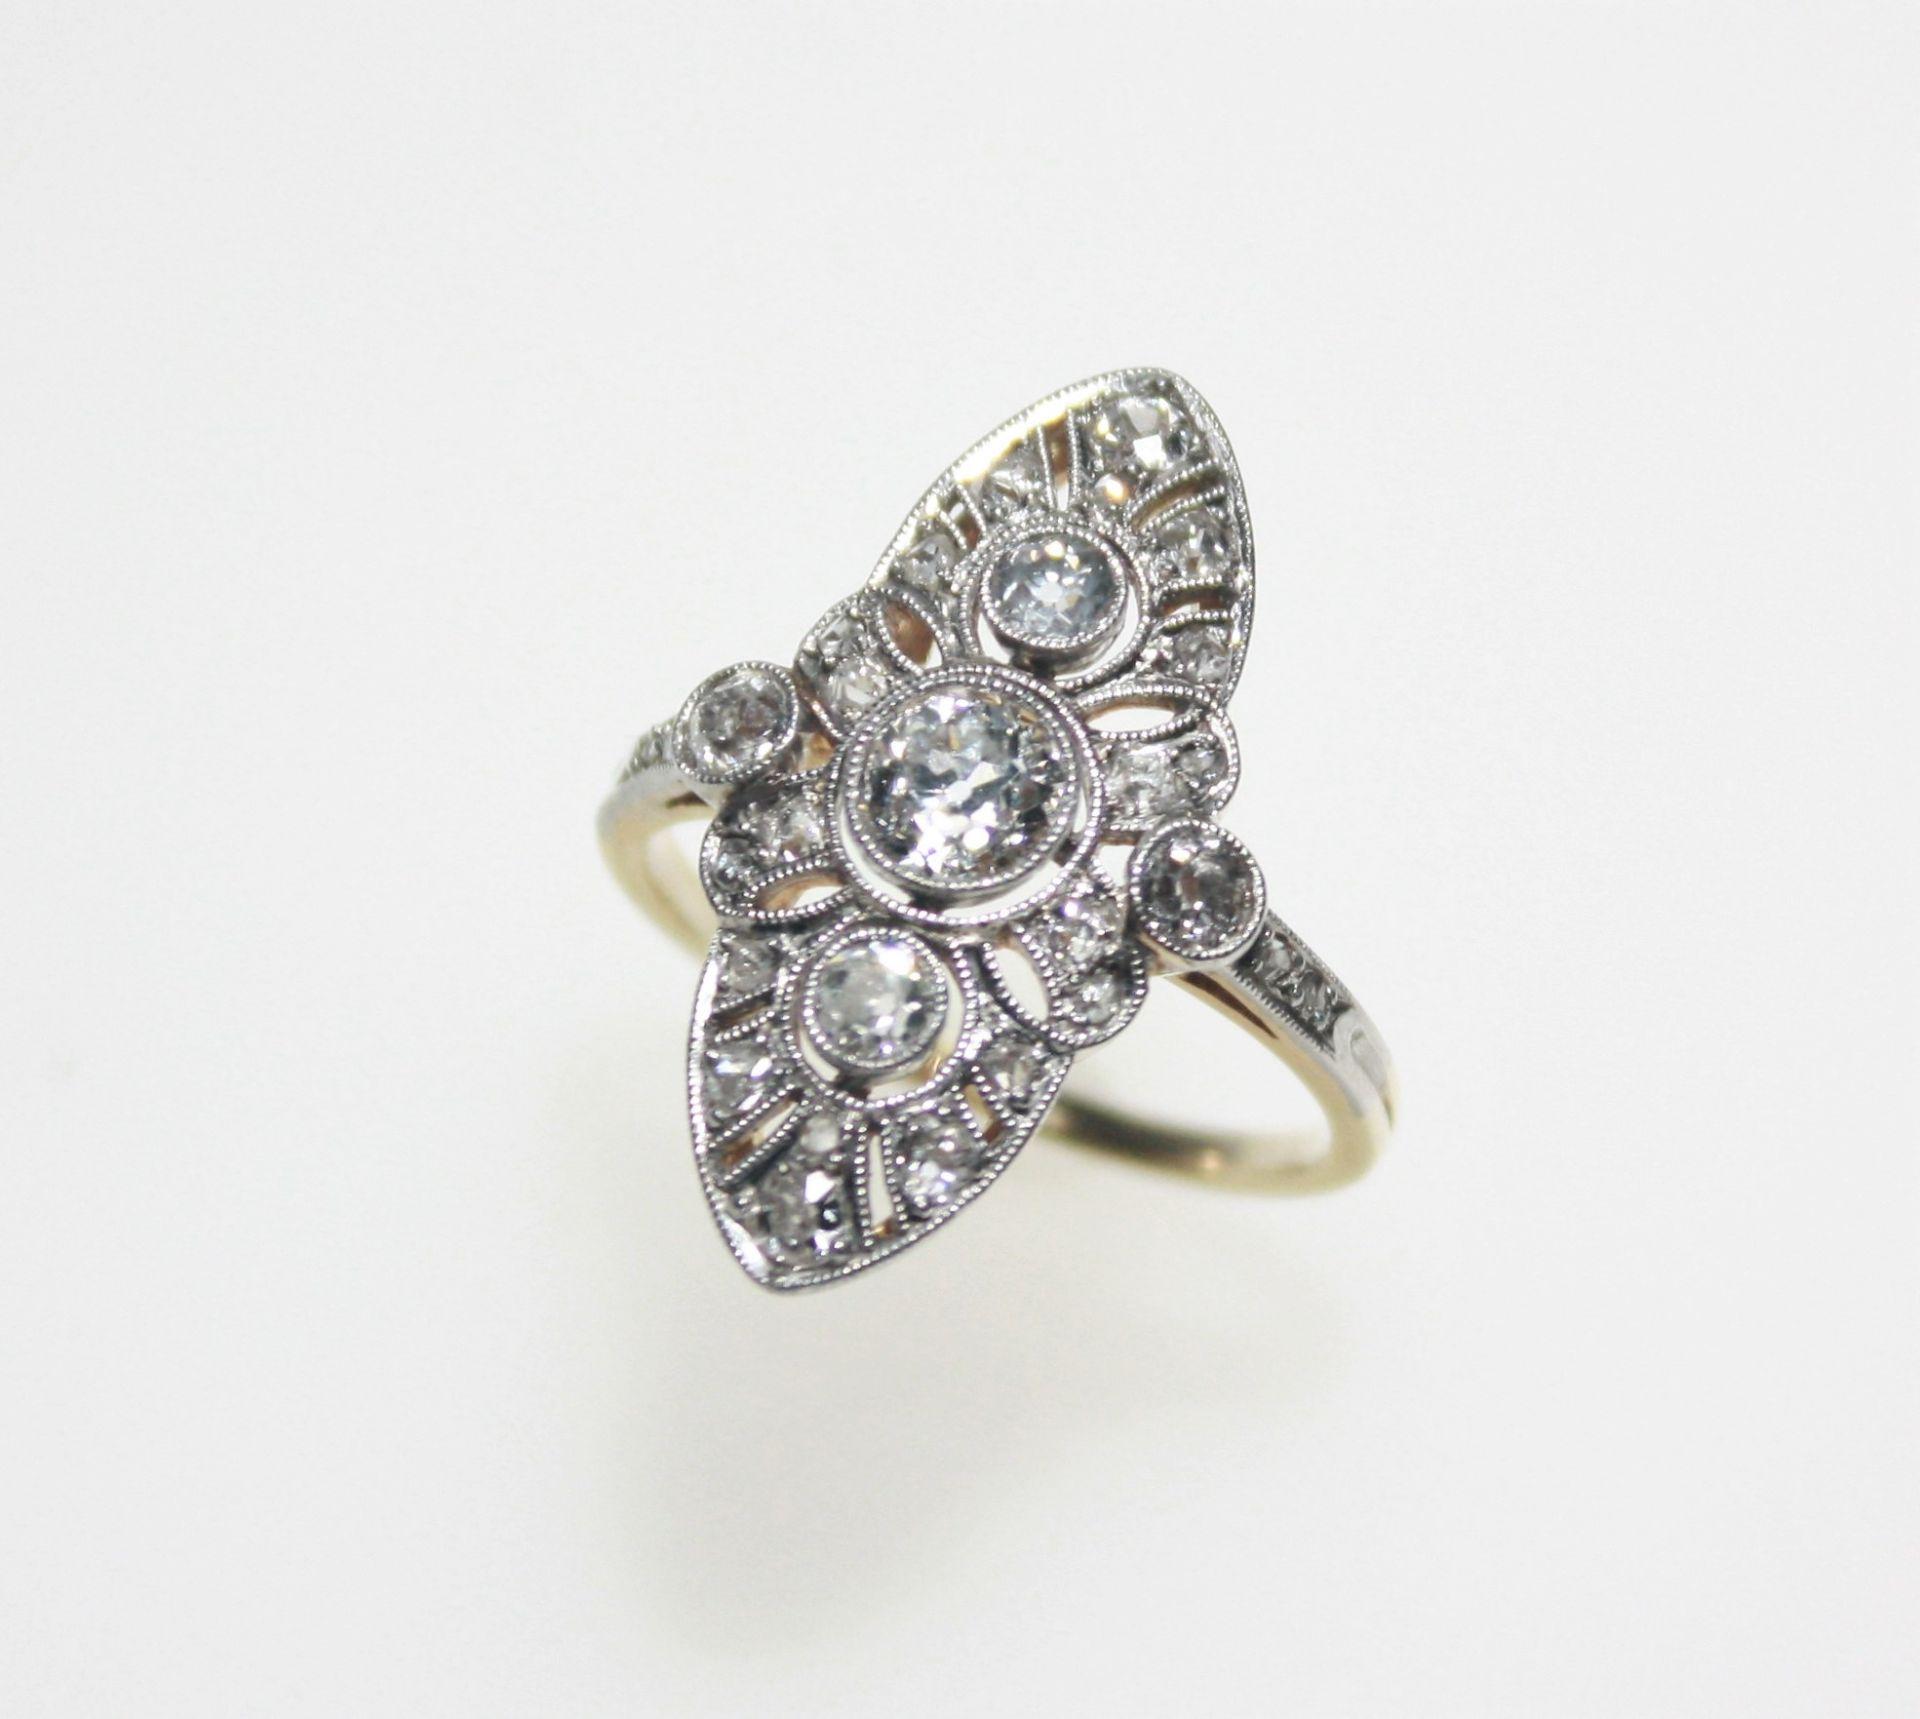 Älterer, goldener Ring mit weißer Aufsicht ca. 585/f, Art Deco, navette förmiger Ringkopf mit vier